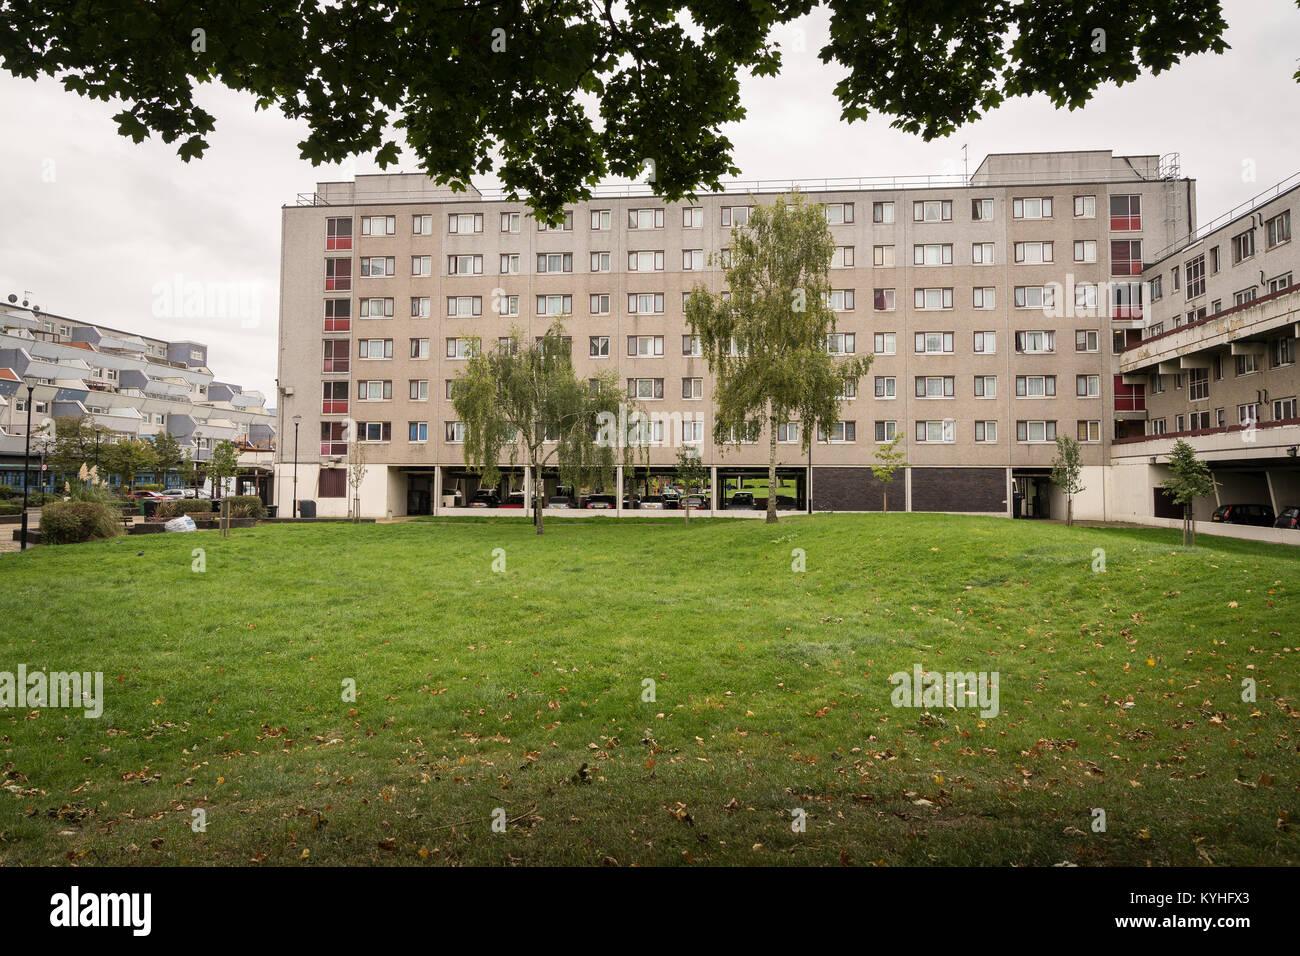 Social Housing London Stock Photos & Social Housing London Stock